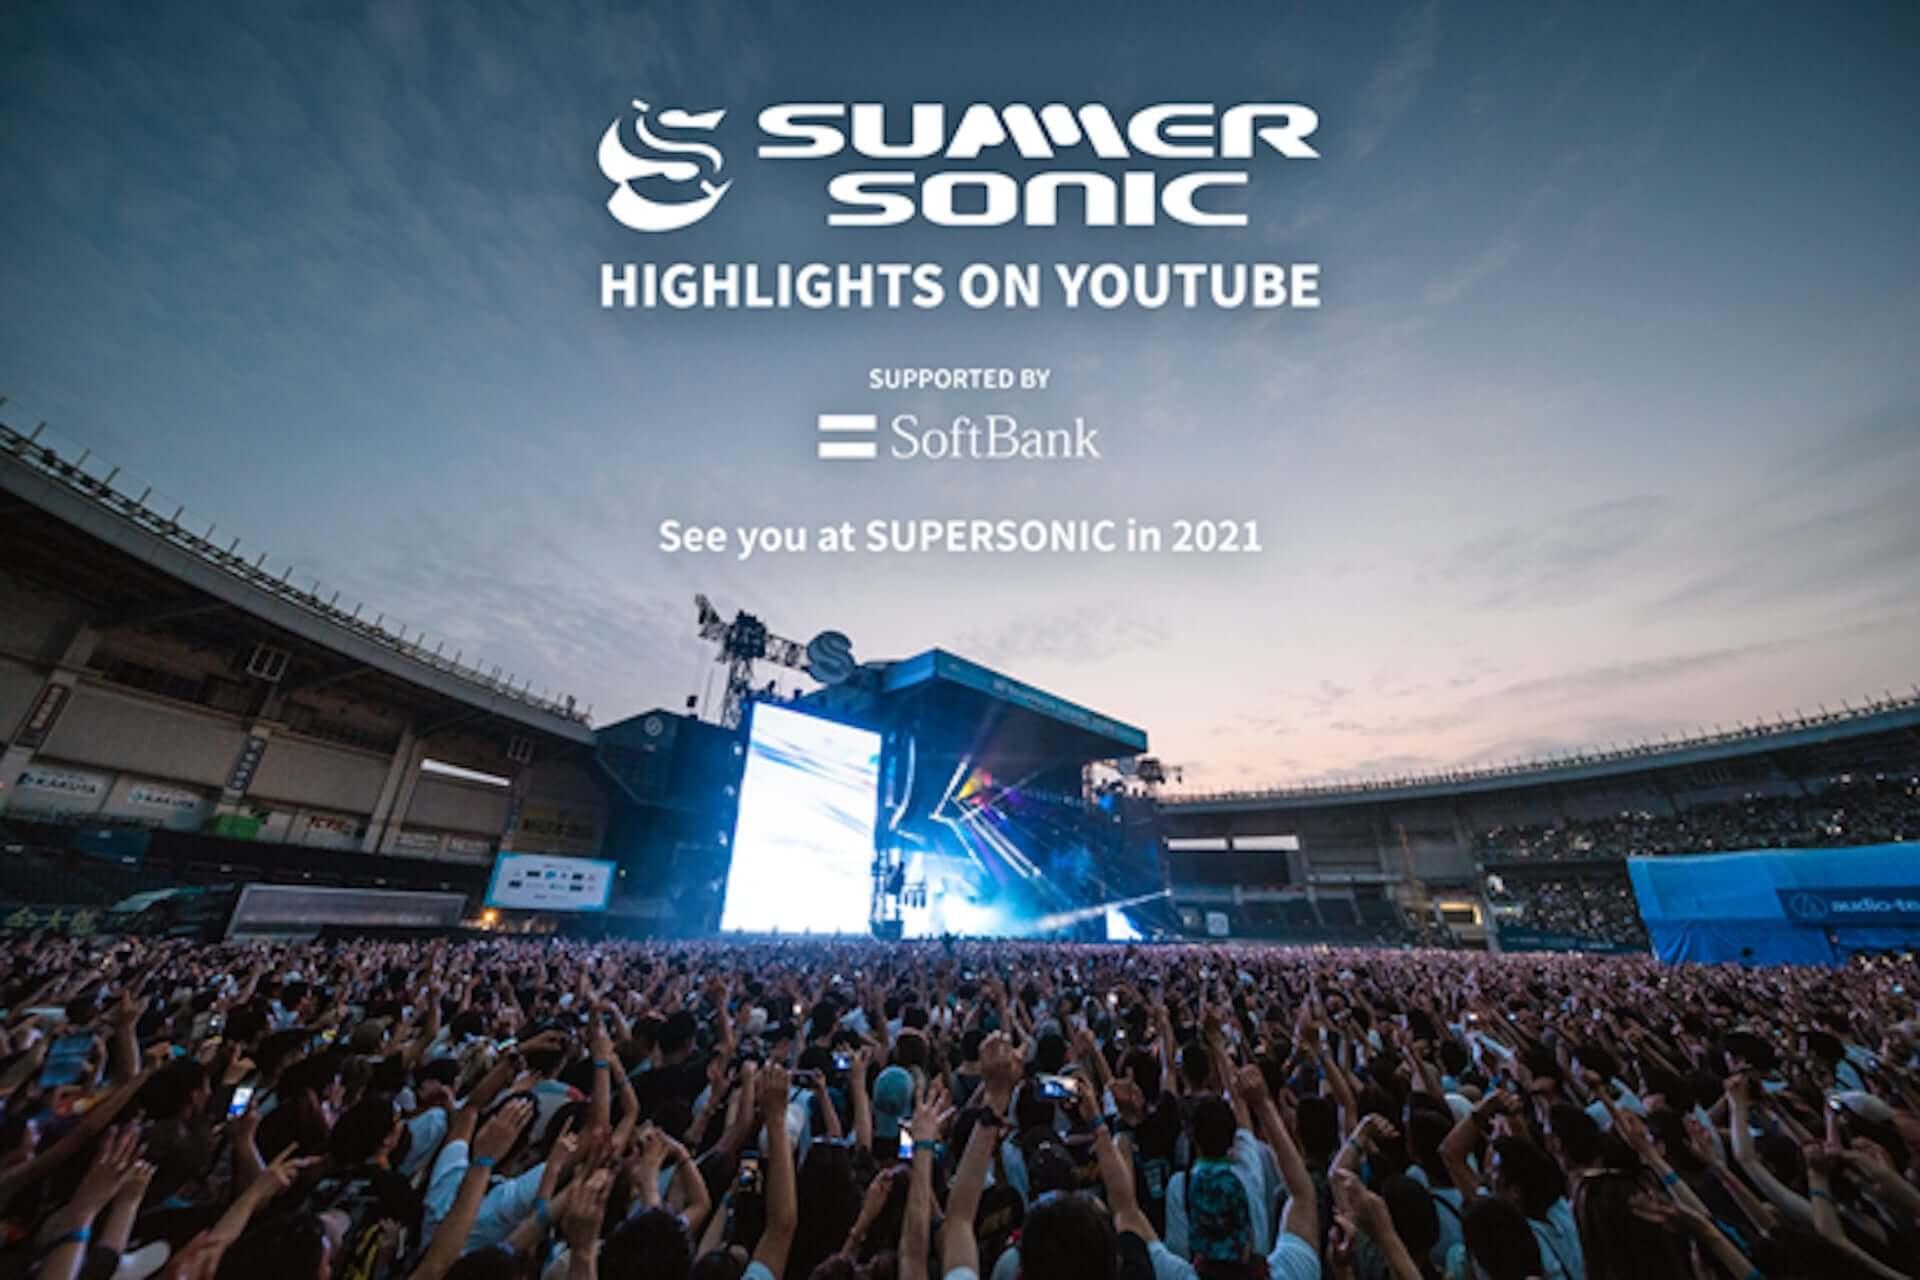 <SUMMER SONIC>20年に渡る過去のライブ映像が公開決定!Underworld、The 1975、Daft Punk、My Bloody Valentineなど多数ラインナップ music201118_summersonic_1-1920x1280